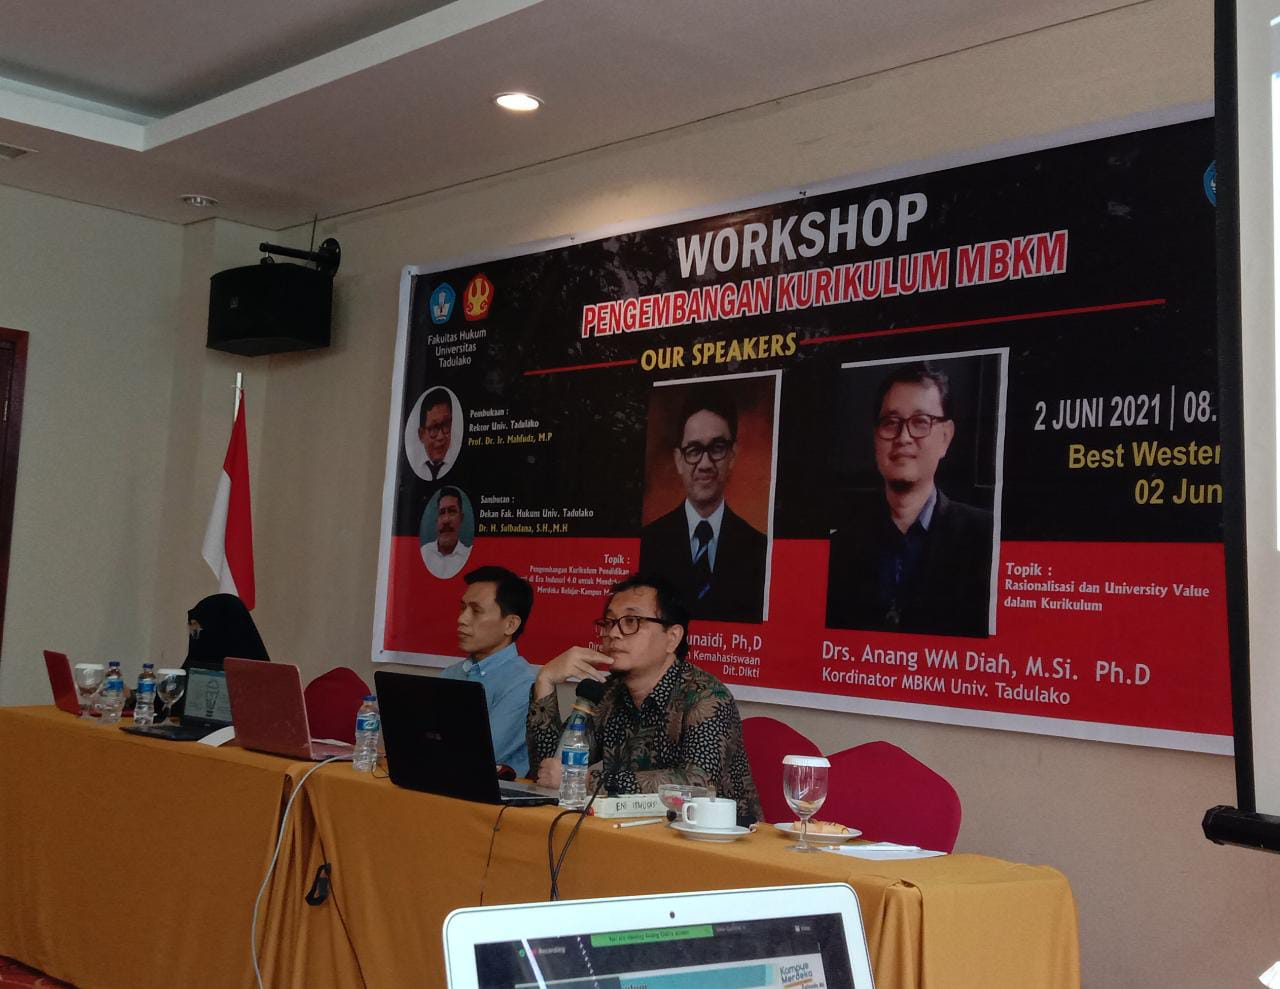 Fakultas Hukum Untad Gelar Workshop Pengembangan Kurikulum Merdeka Belajar Kampus Merdeka